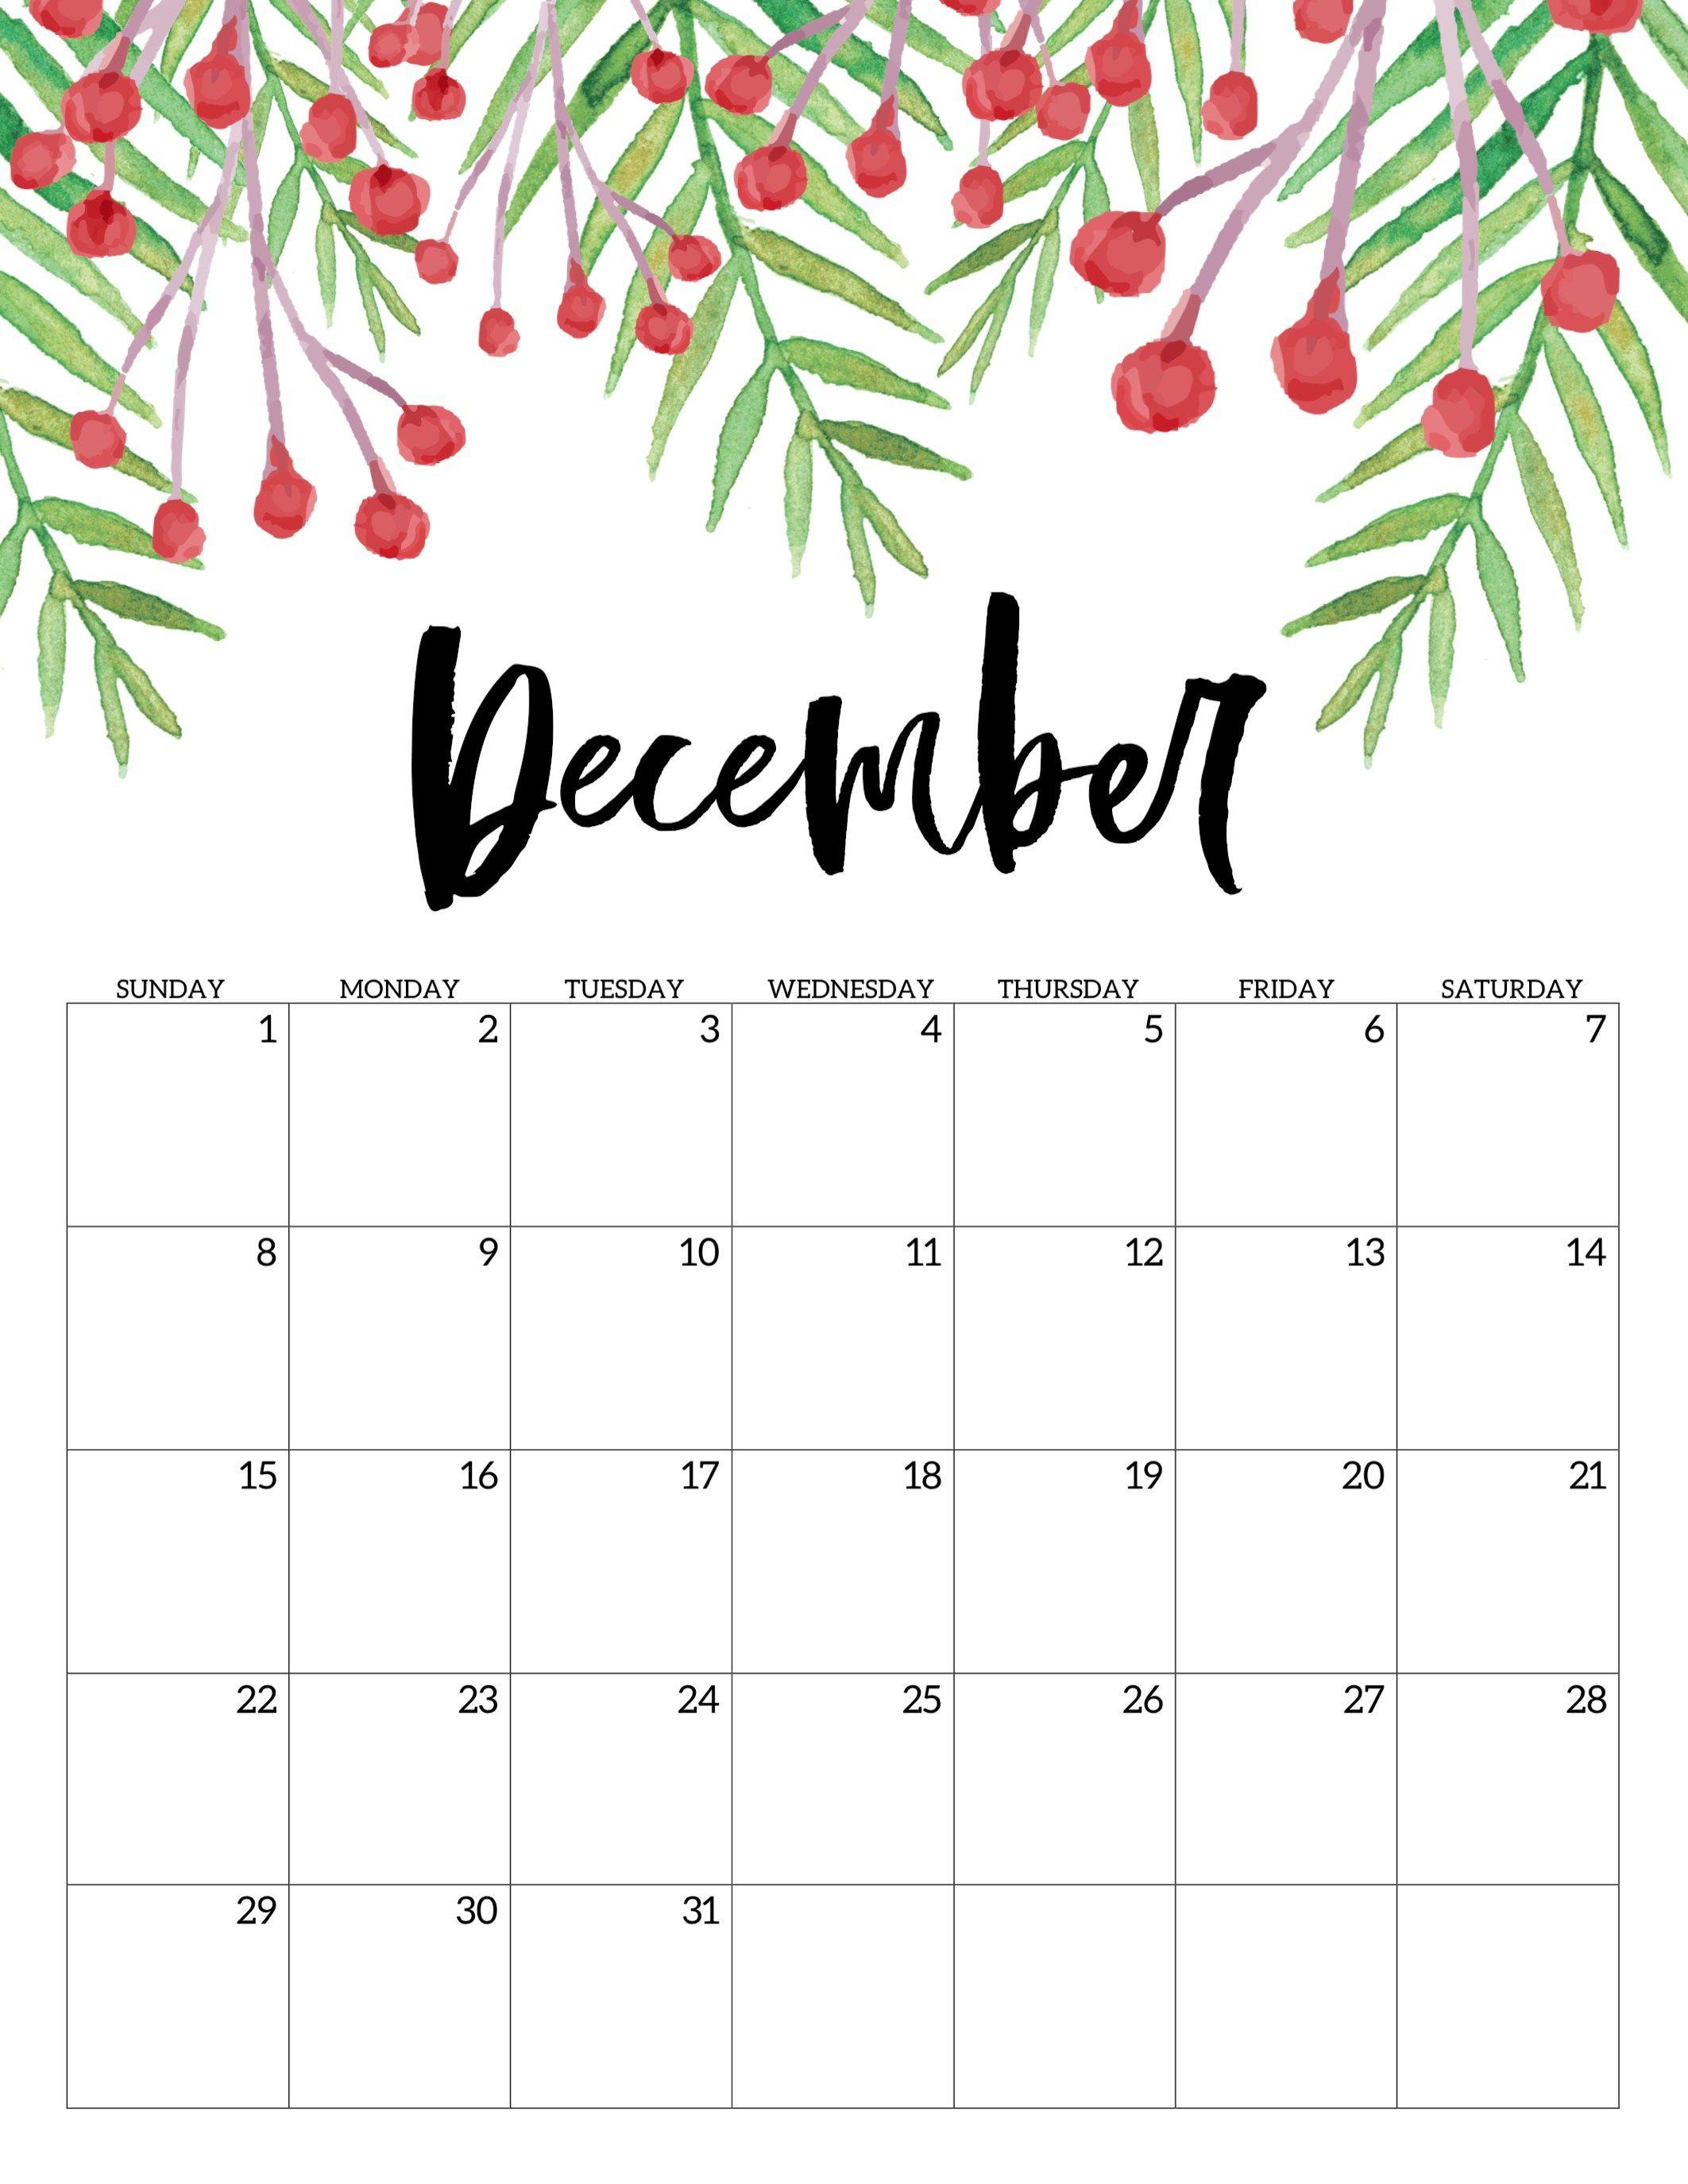 Free Printable Calendar 2019 - Floral | Ежемесячные